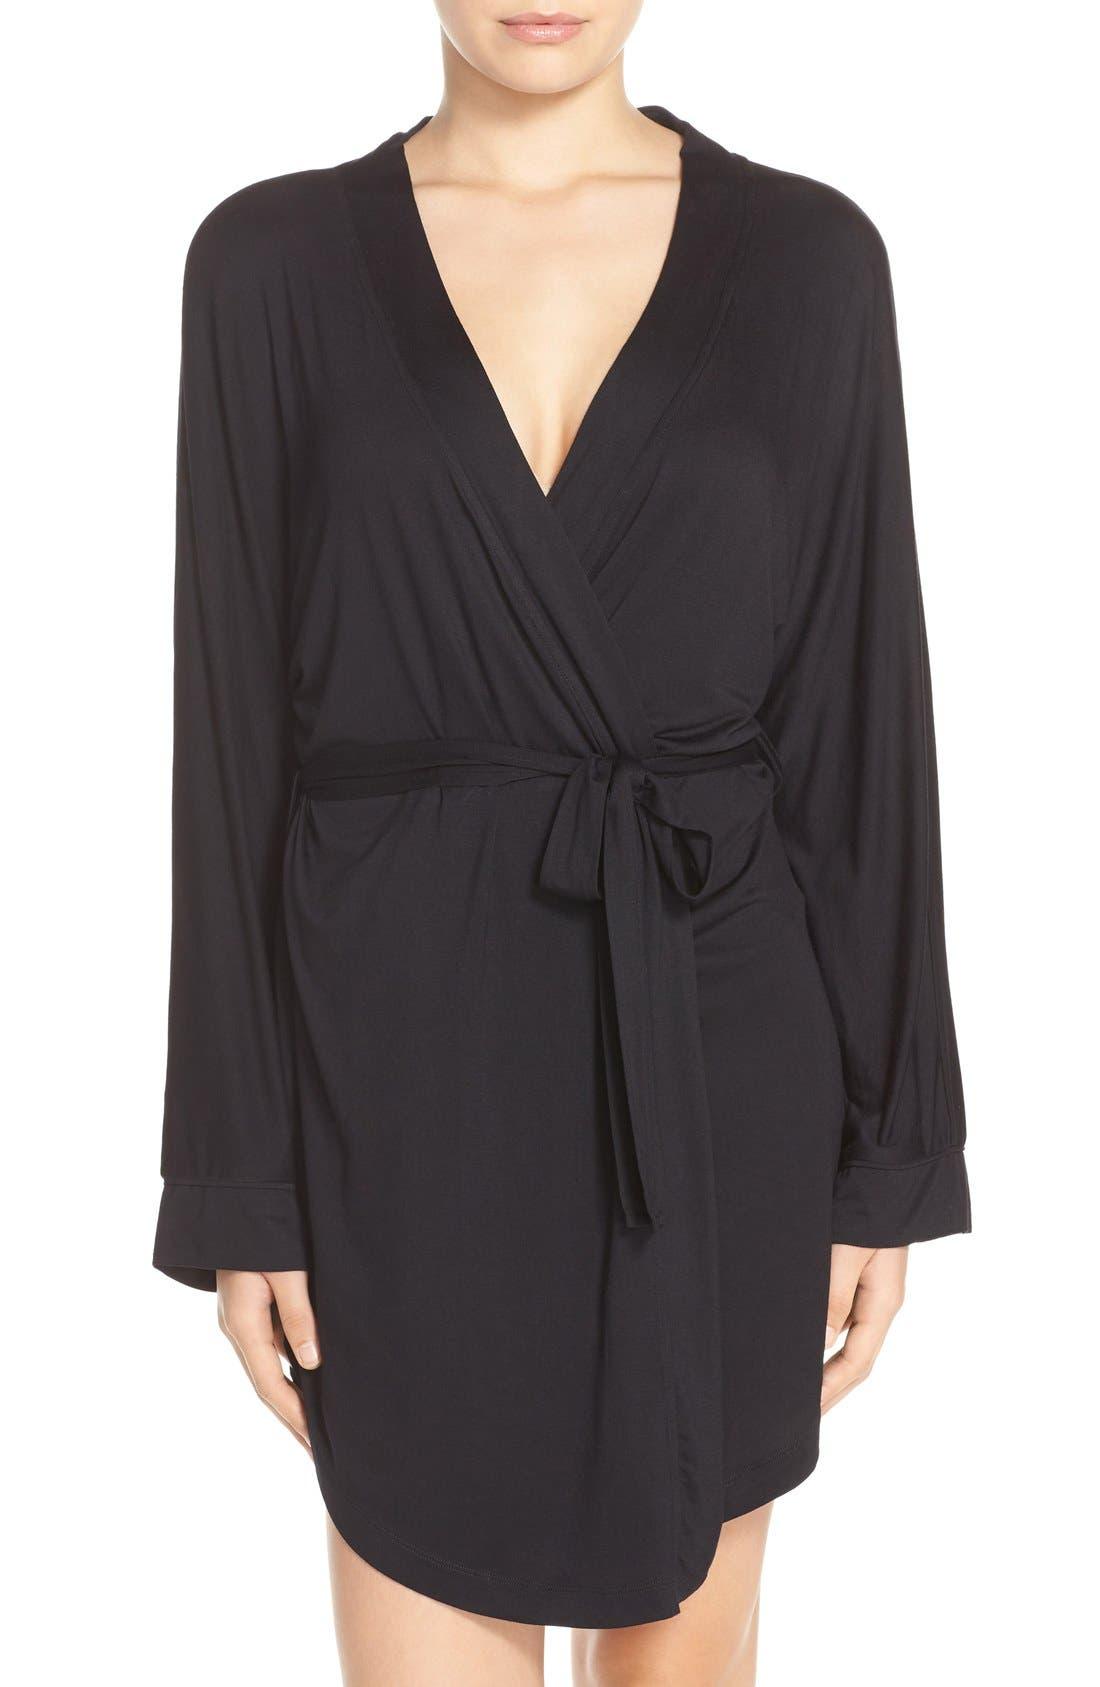 HONEYDEW INTIMATES All American Jersey Robe, Main, color, BLACK